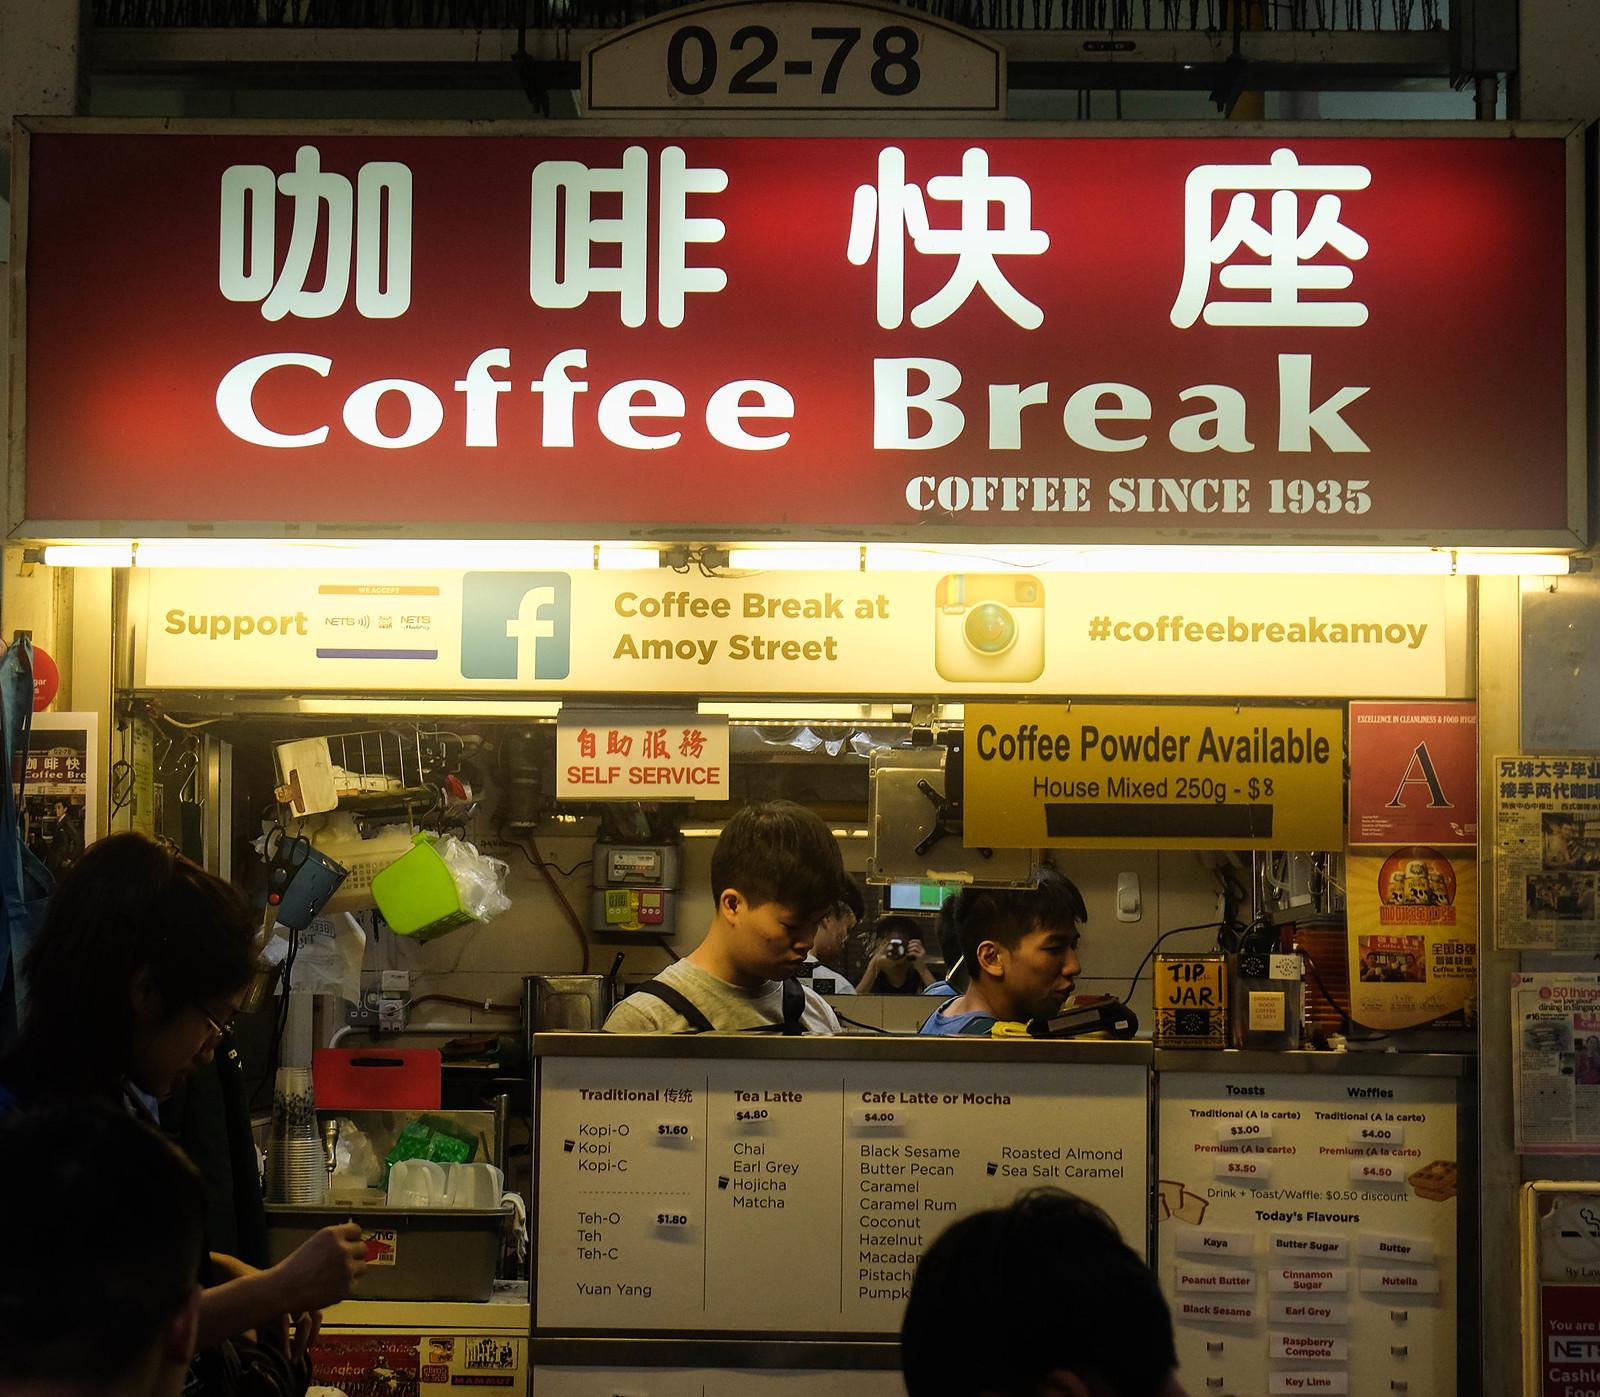 amoy street food centre vwin体育Coffee Break storefront